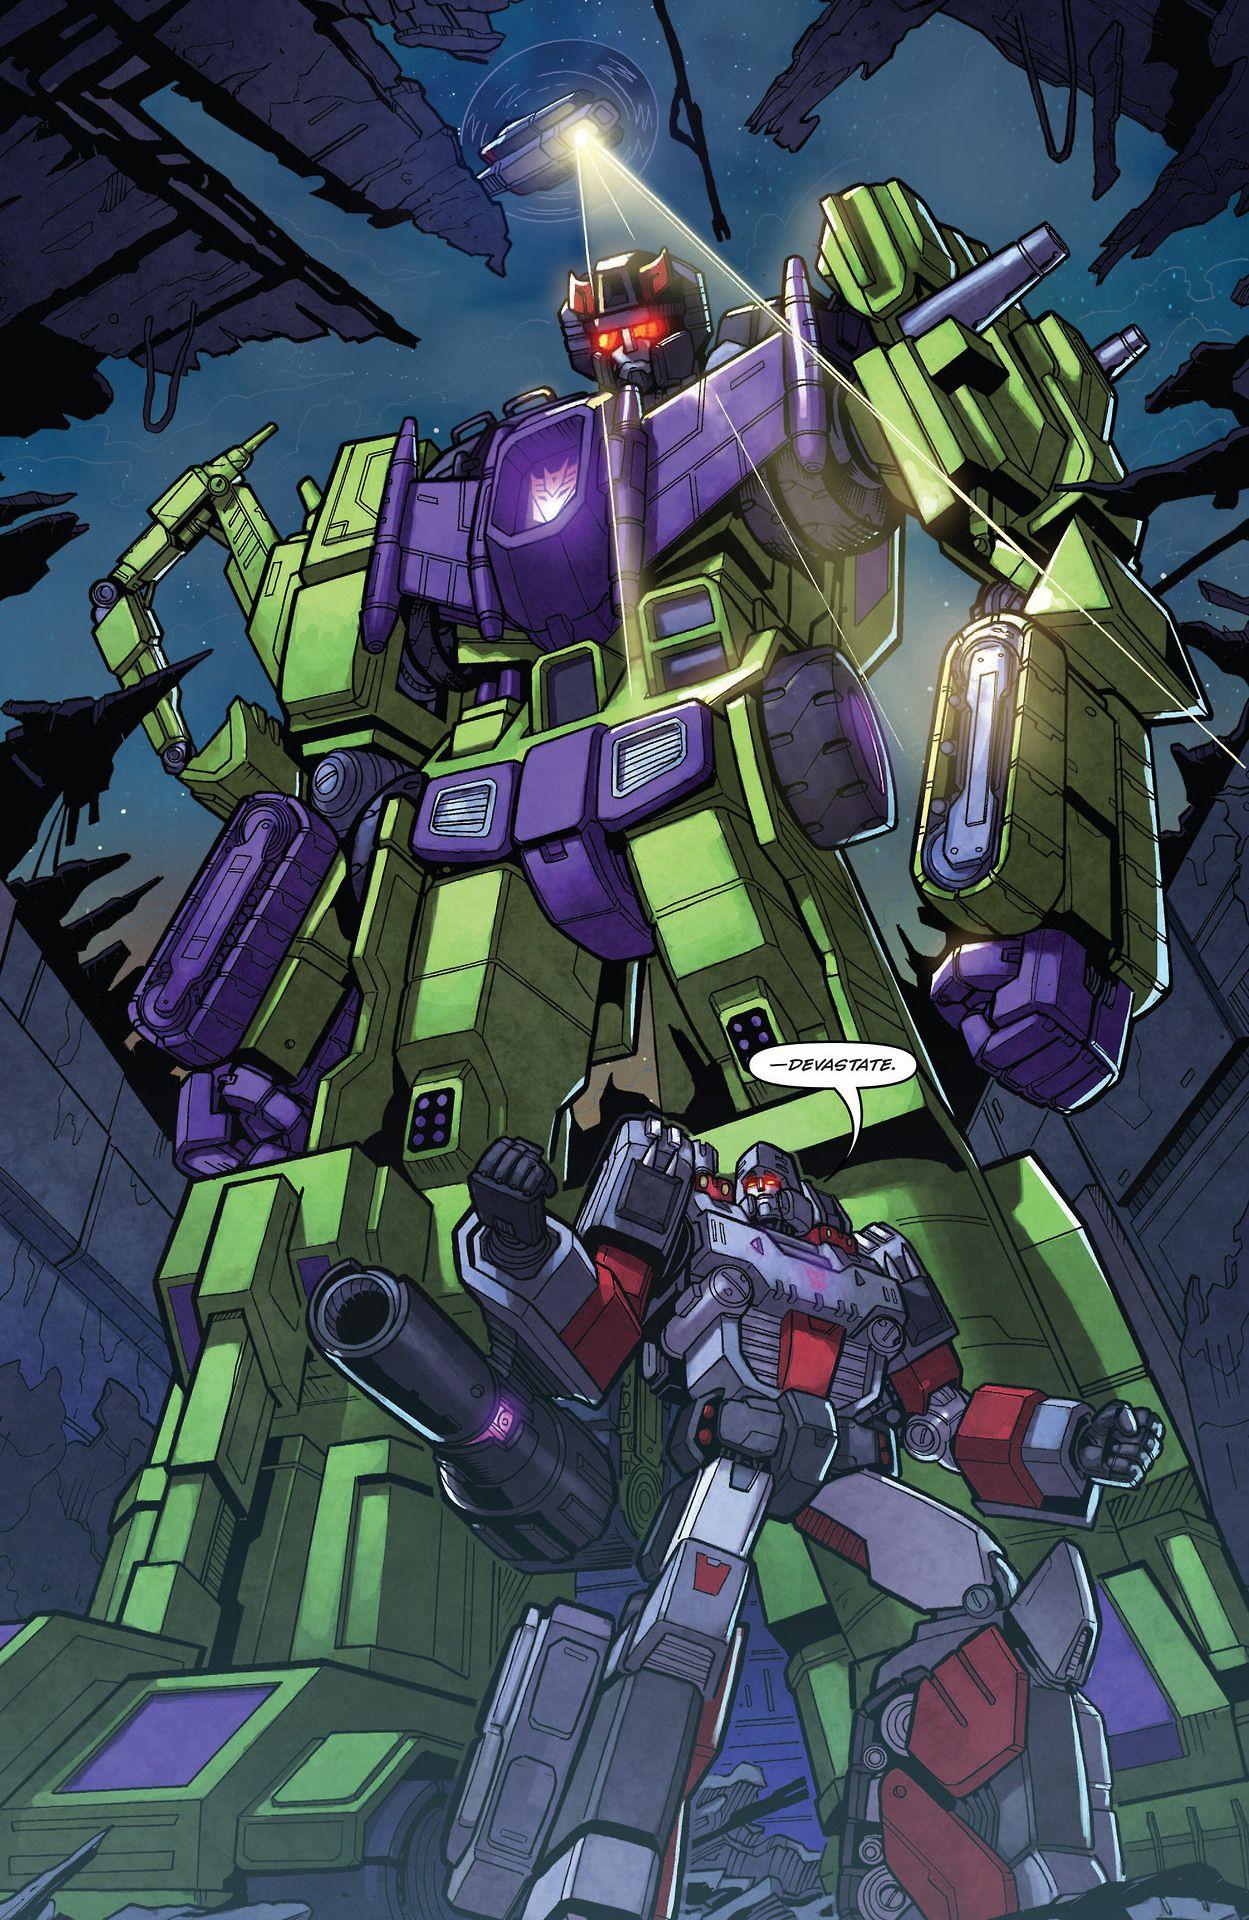 Devastate Transformers Decepticons Transformers Transformers